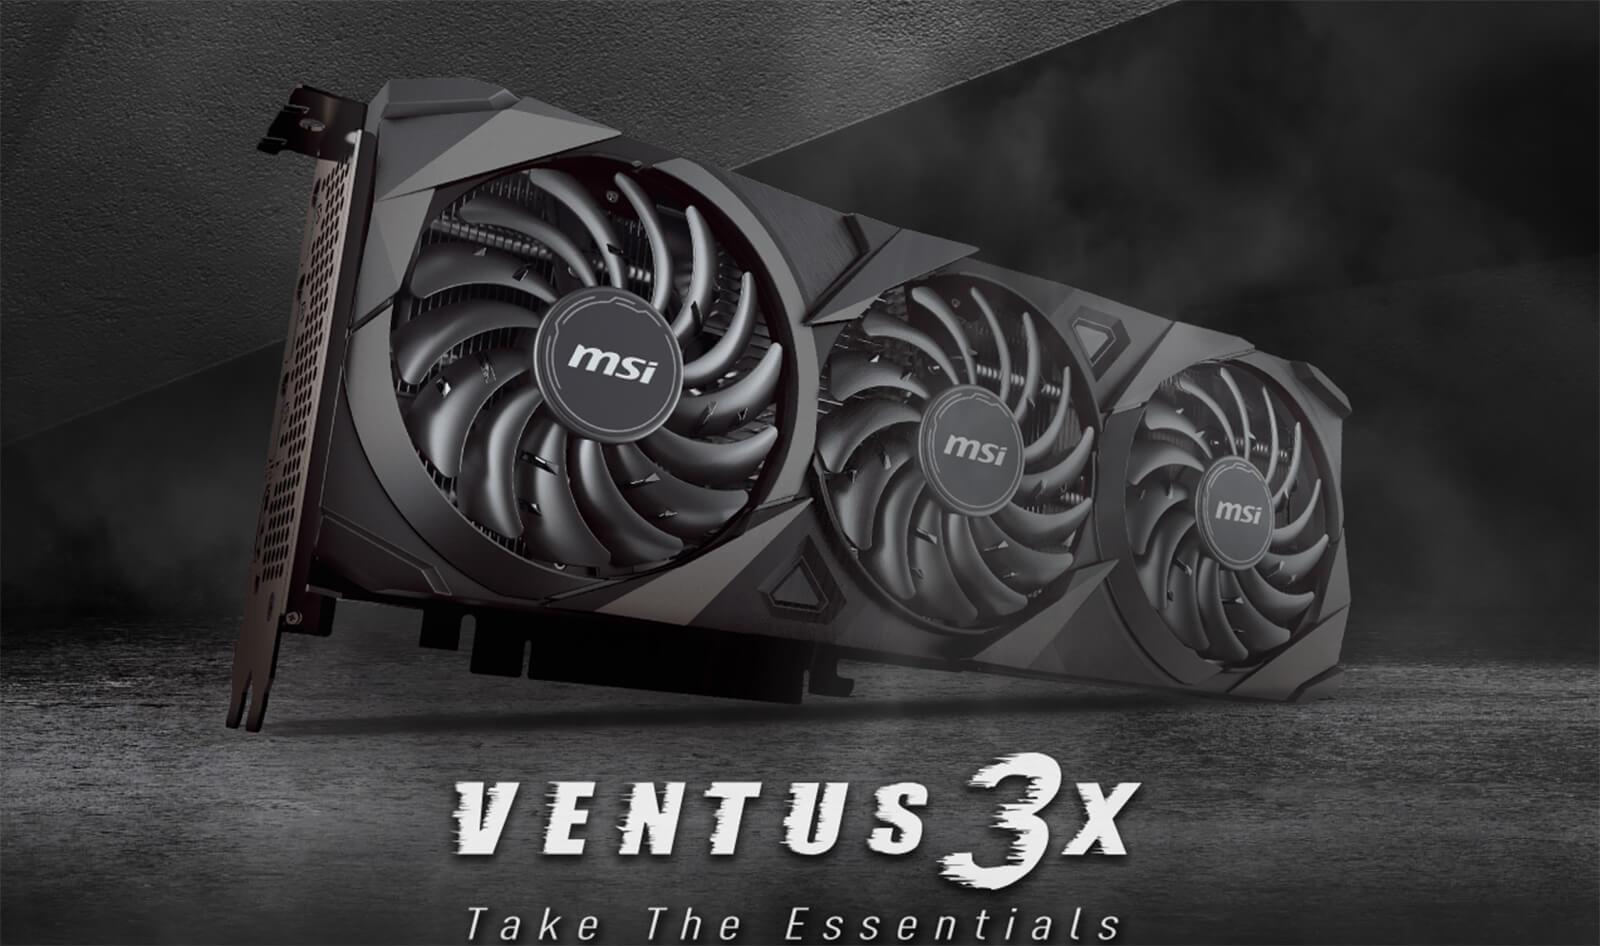 Msi Geforce Rtx™ 3060 Ventus 3x 12g Features